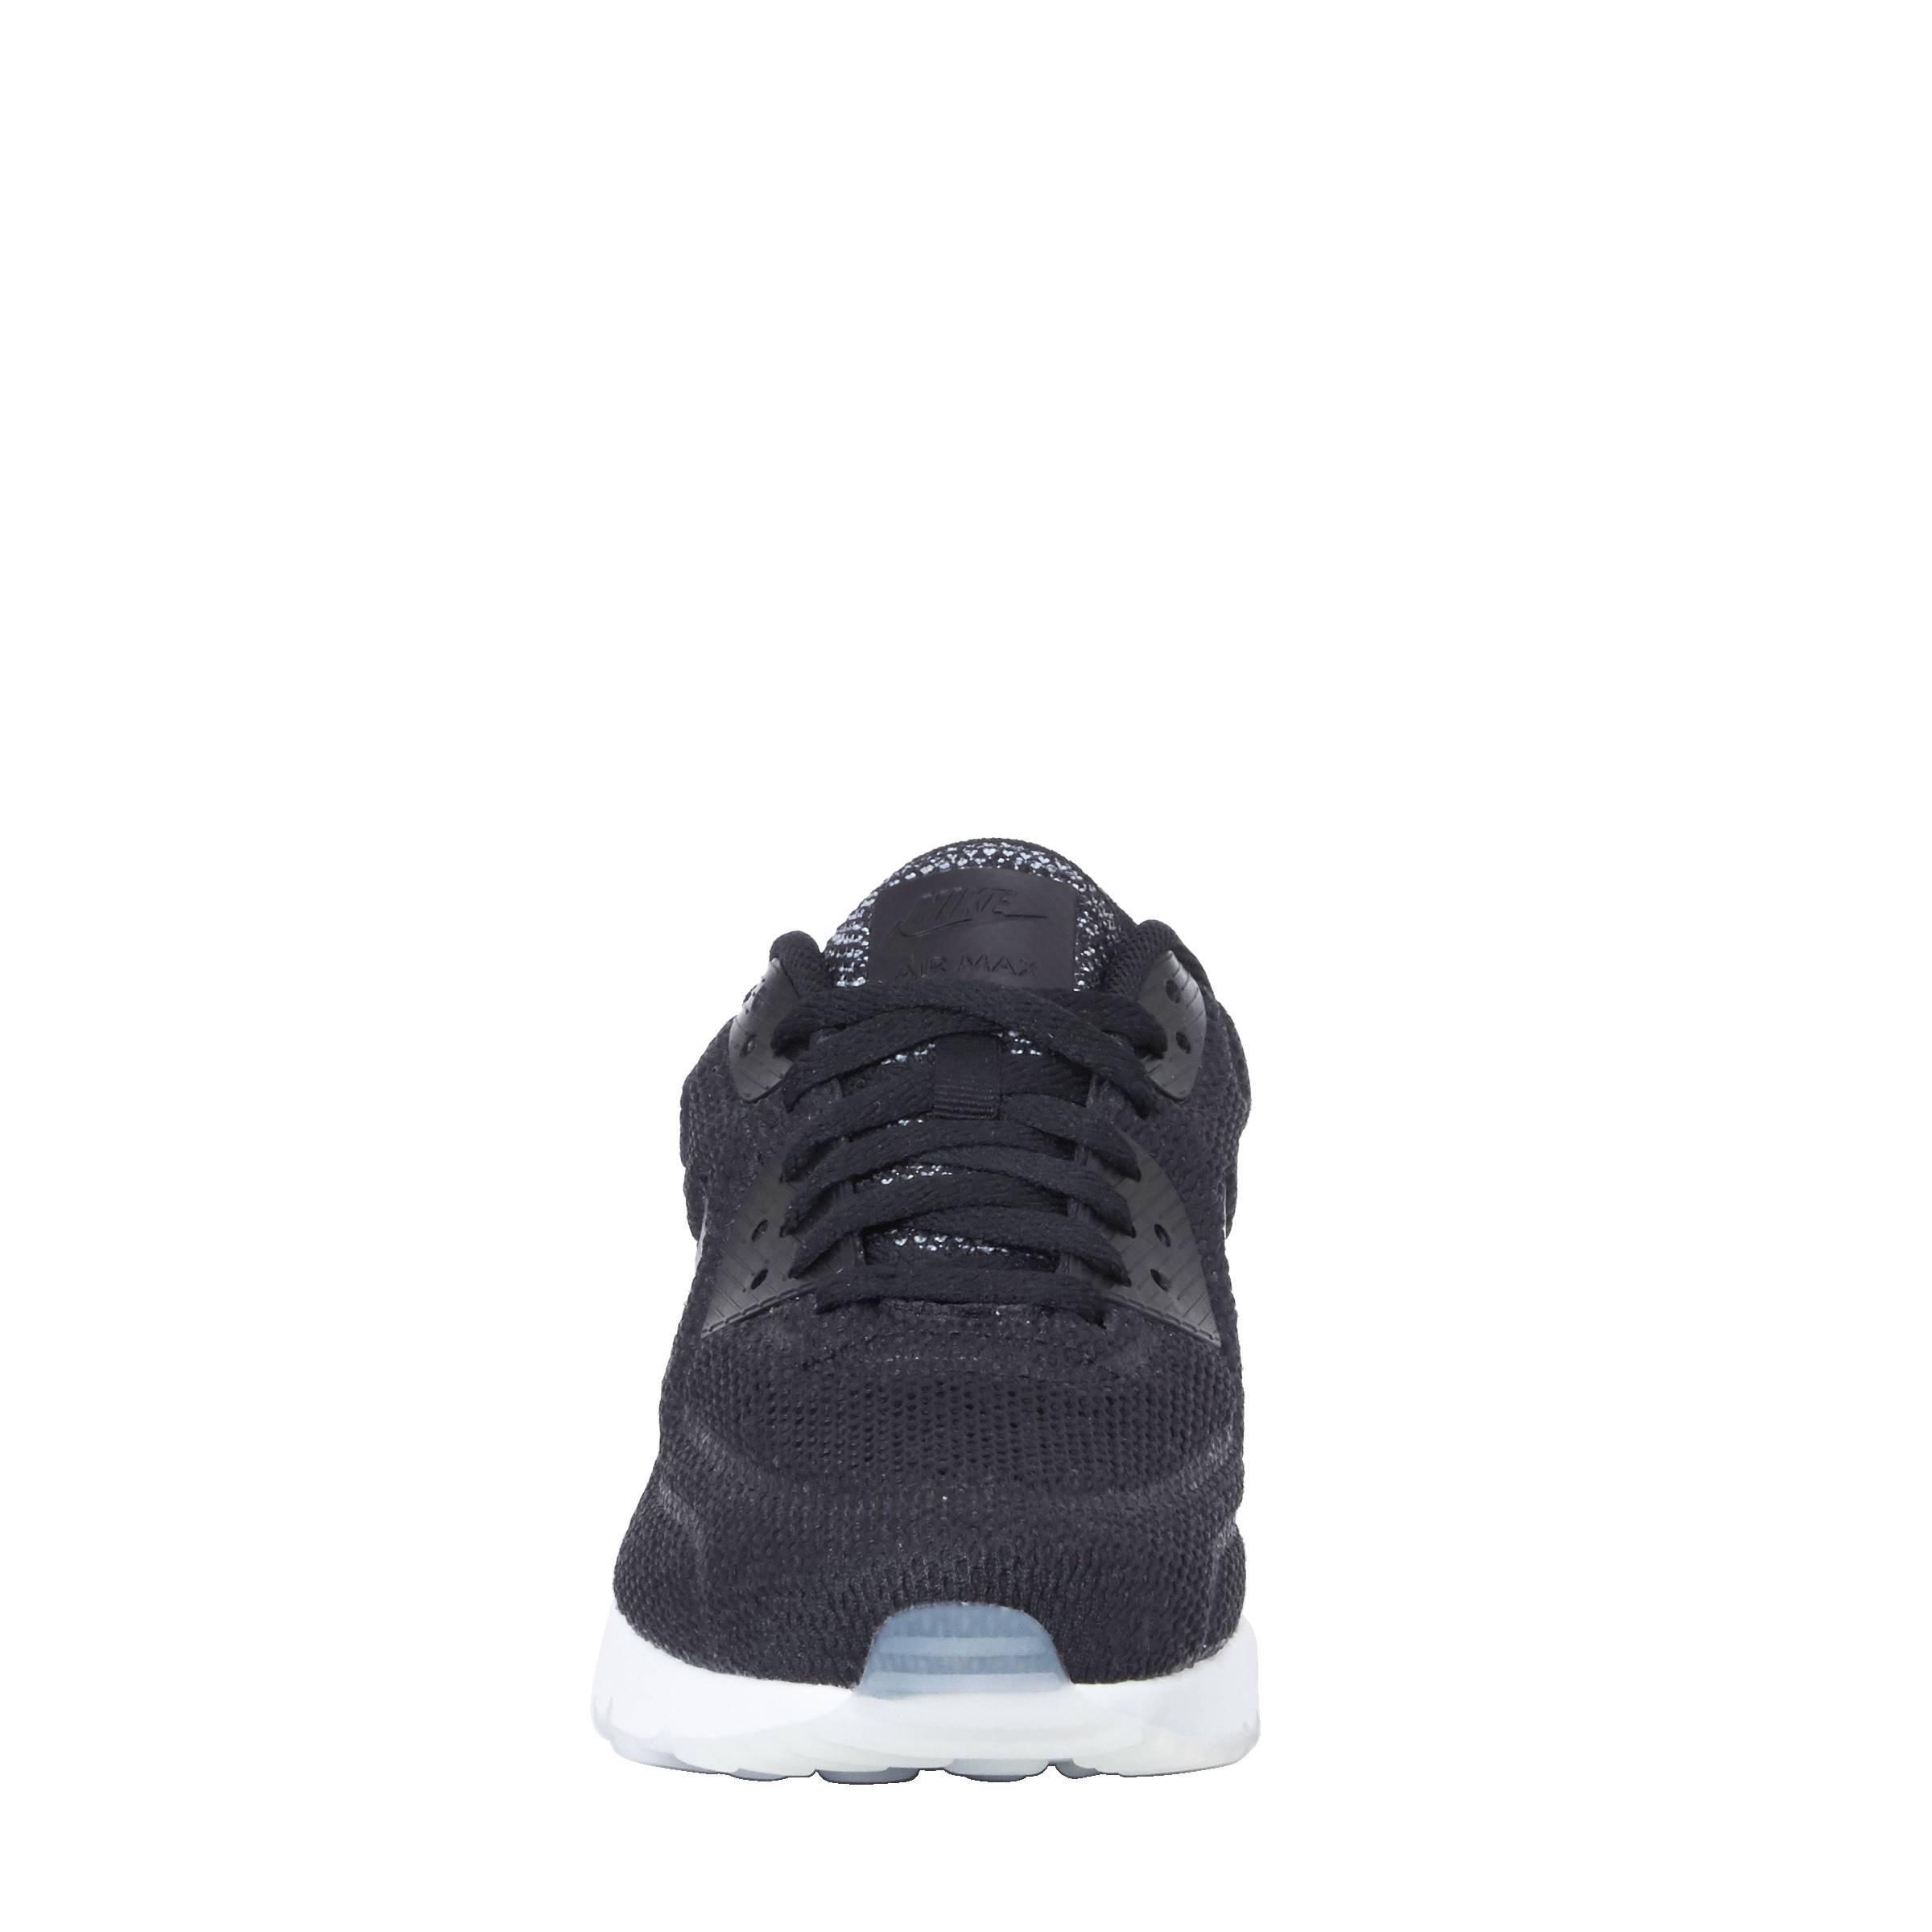 Nike W Air Max 90 Ultra BR Black Black White